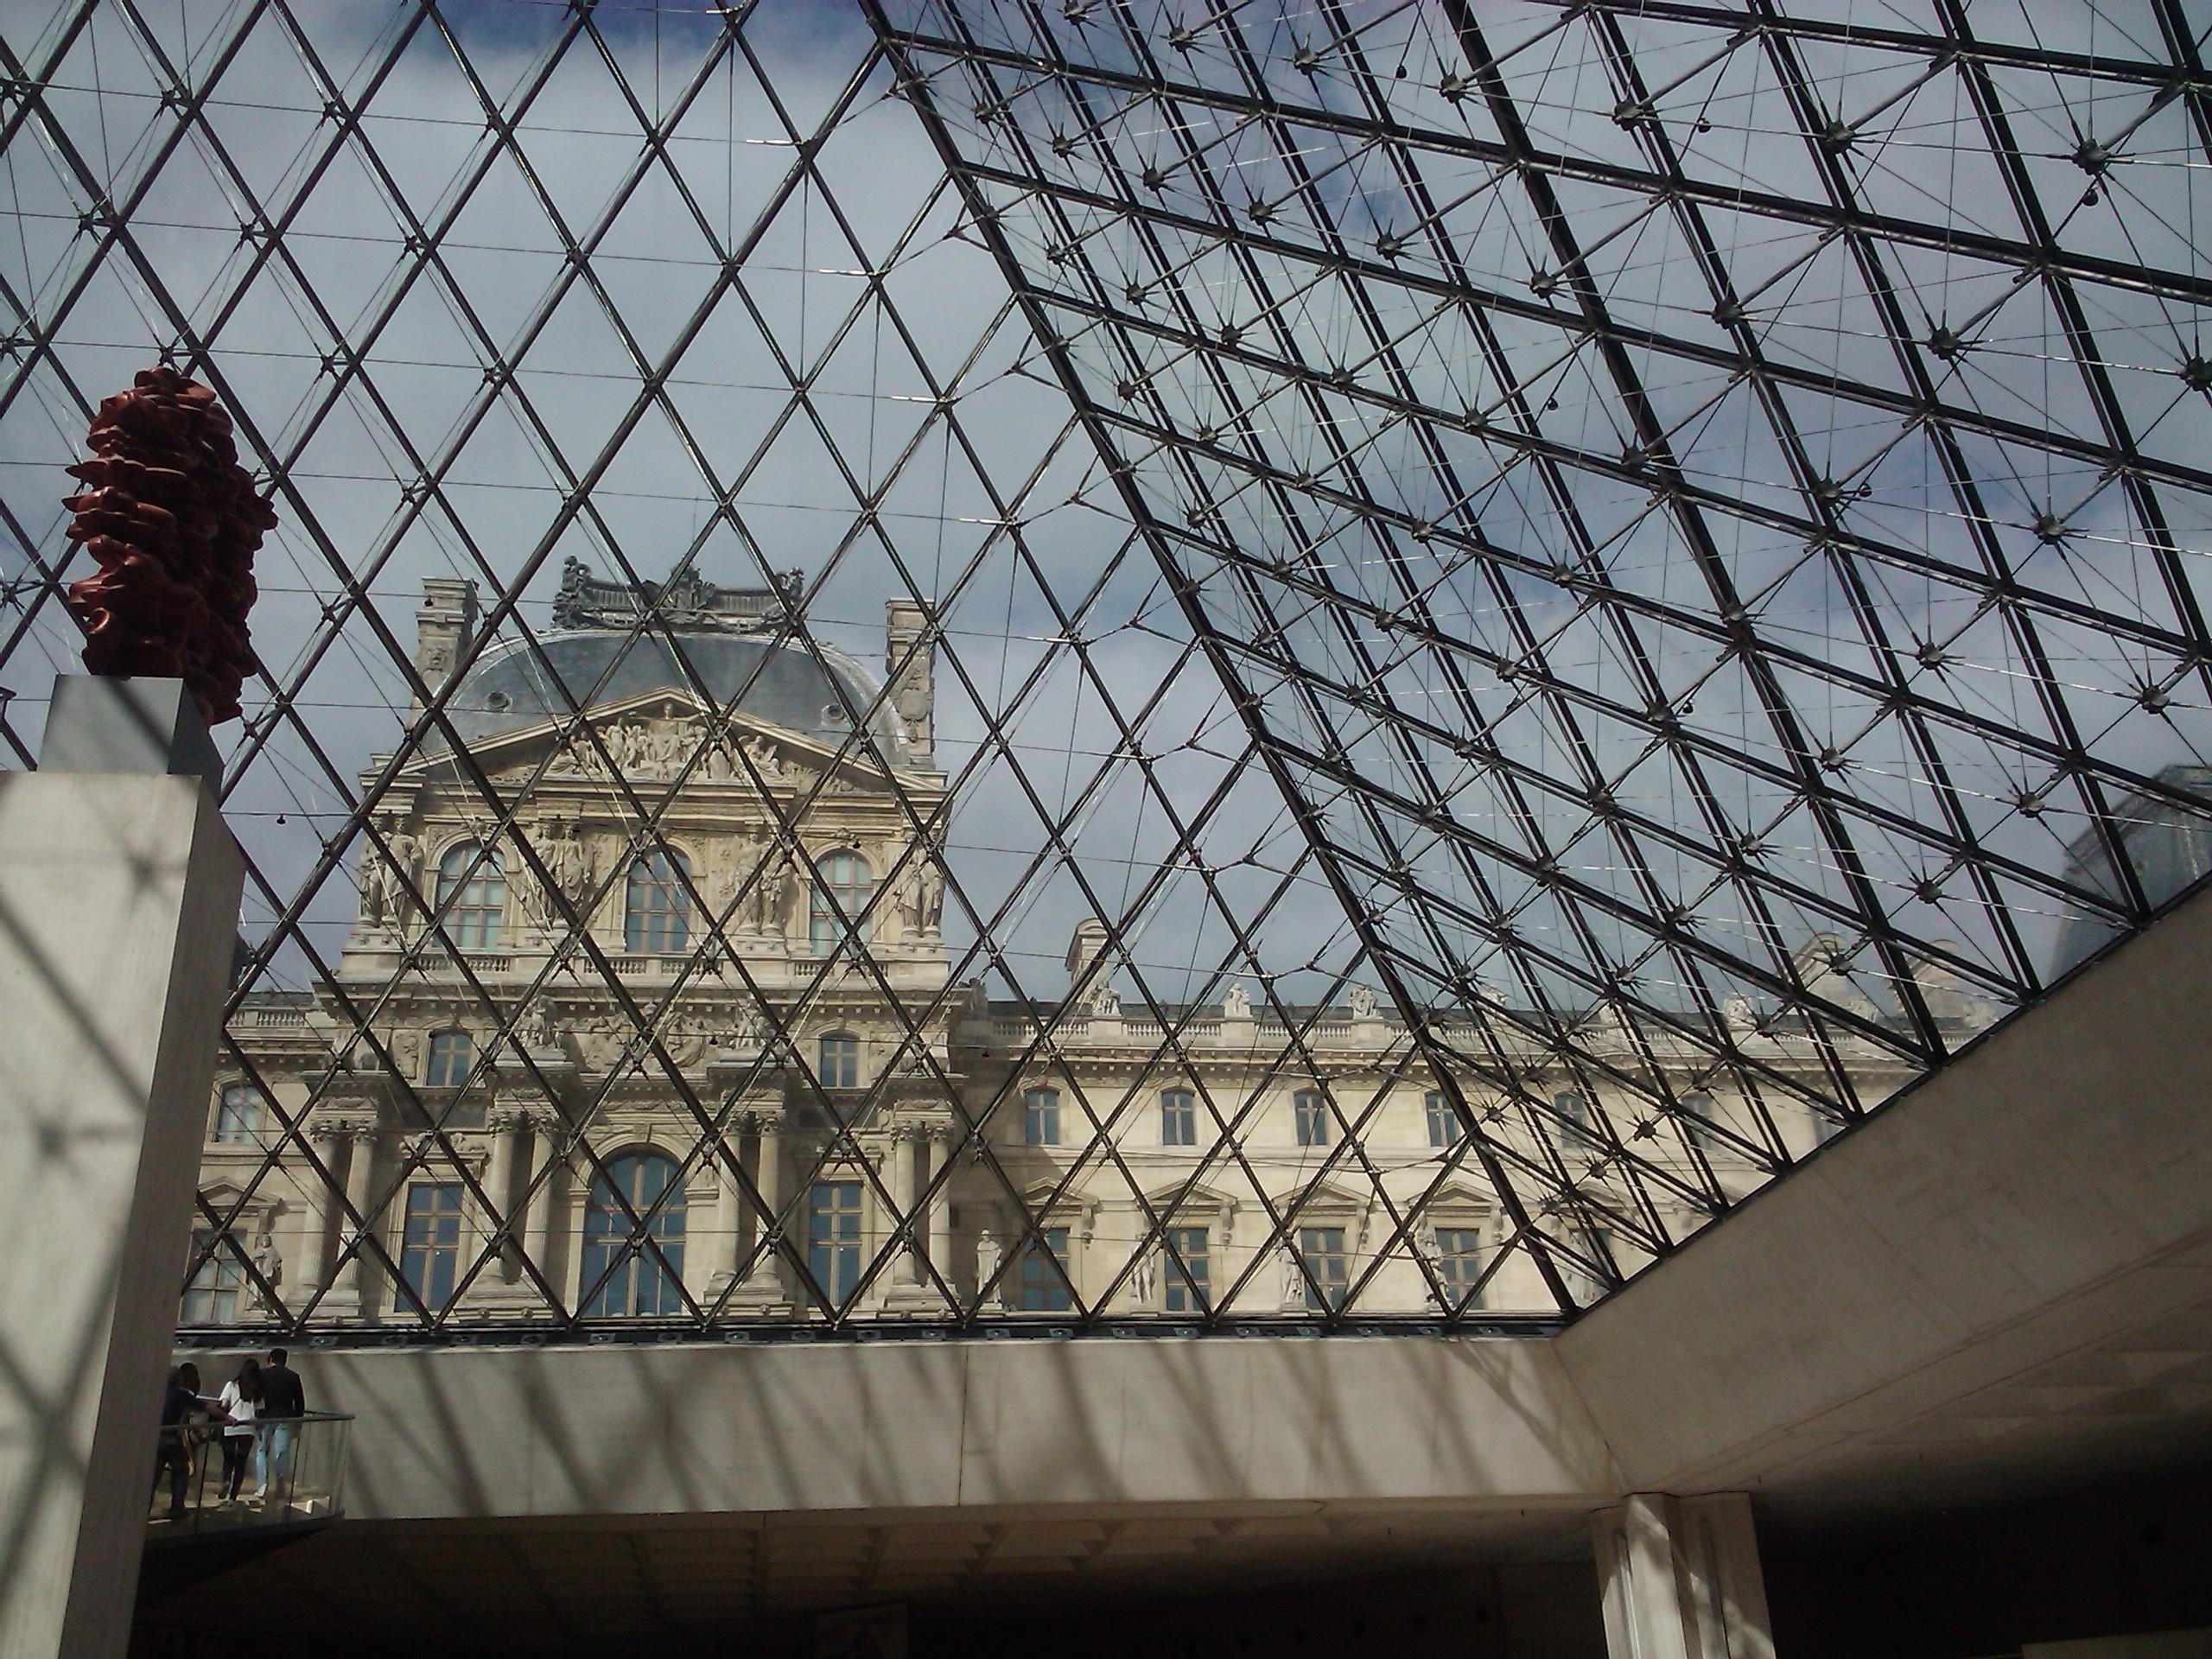 https://upload.wikimedia.org/wikipedia/commons/7/7e/Le_Louvre_depuis_l%27int%C3%A9rieur_de_la_Pyramide_-_panoramio.jpg